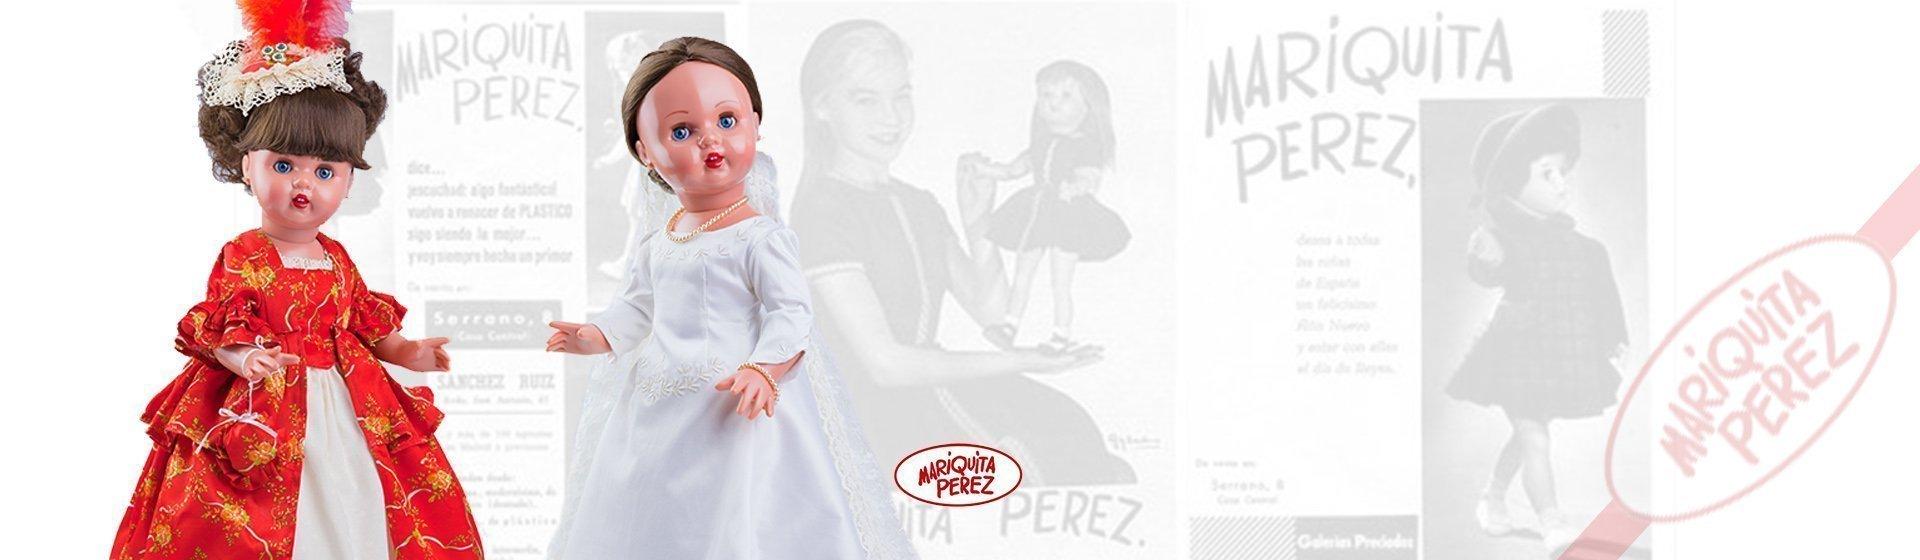 Nuevos Modelos de Mariquita Pérez